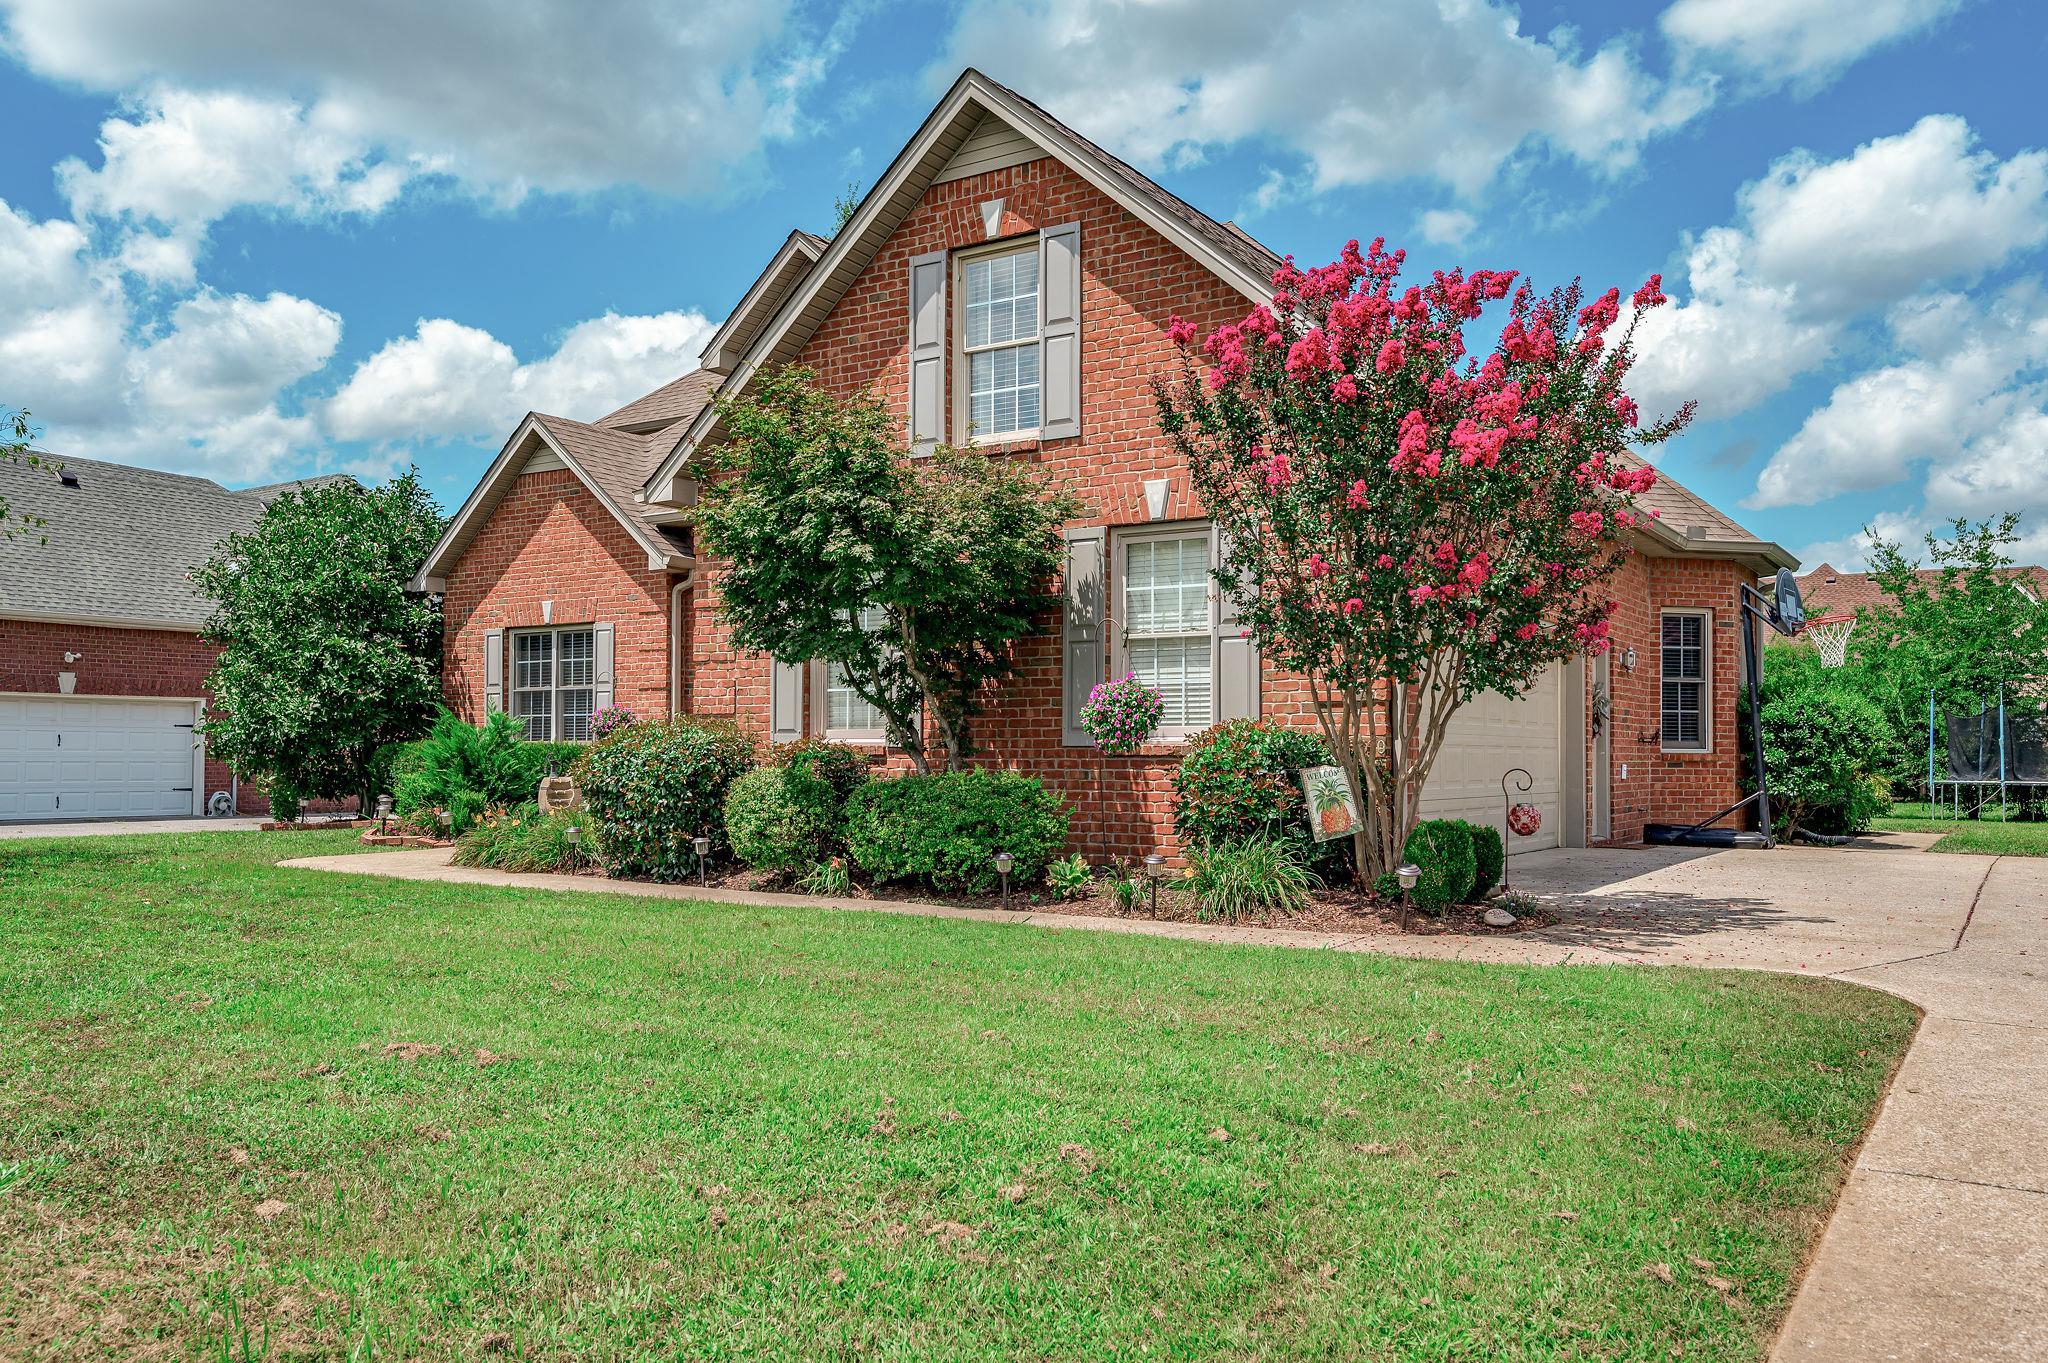 3020 Vicwood Dr, Murfreesboro, TN 37128 - Murfreesboro, TN real estate listing